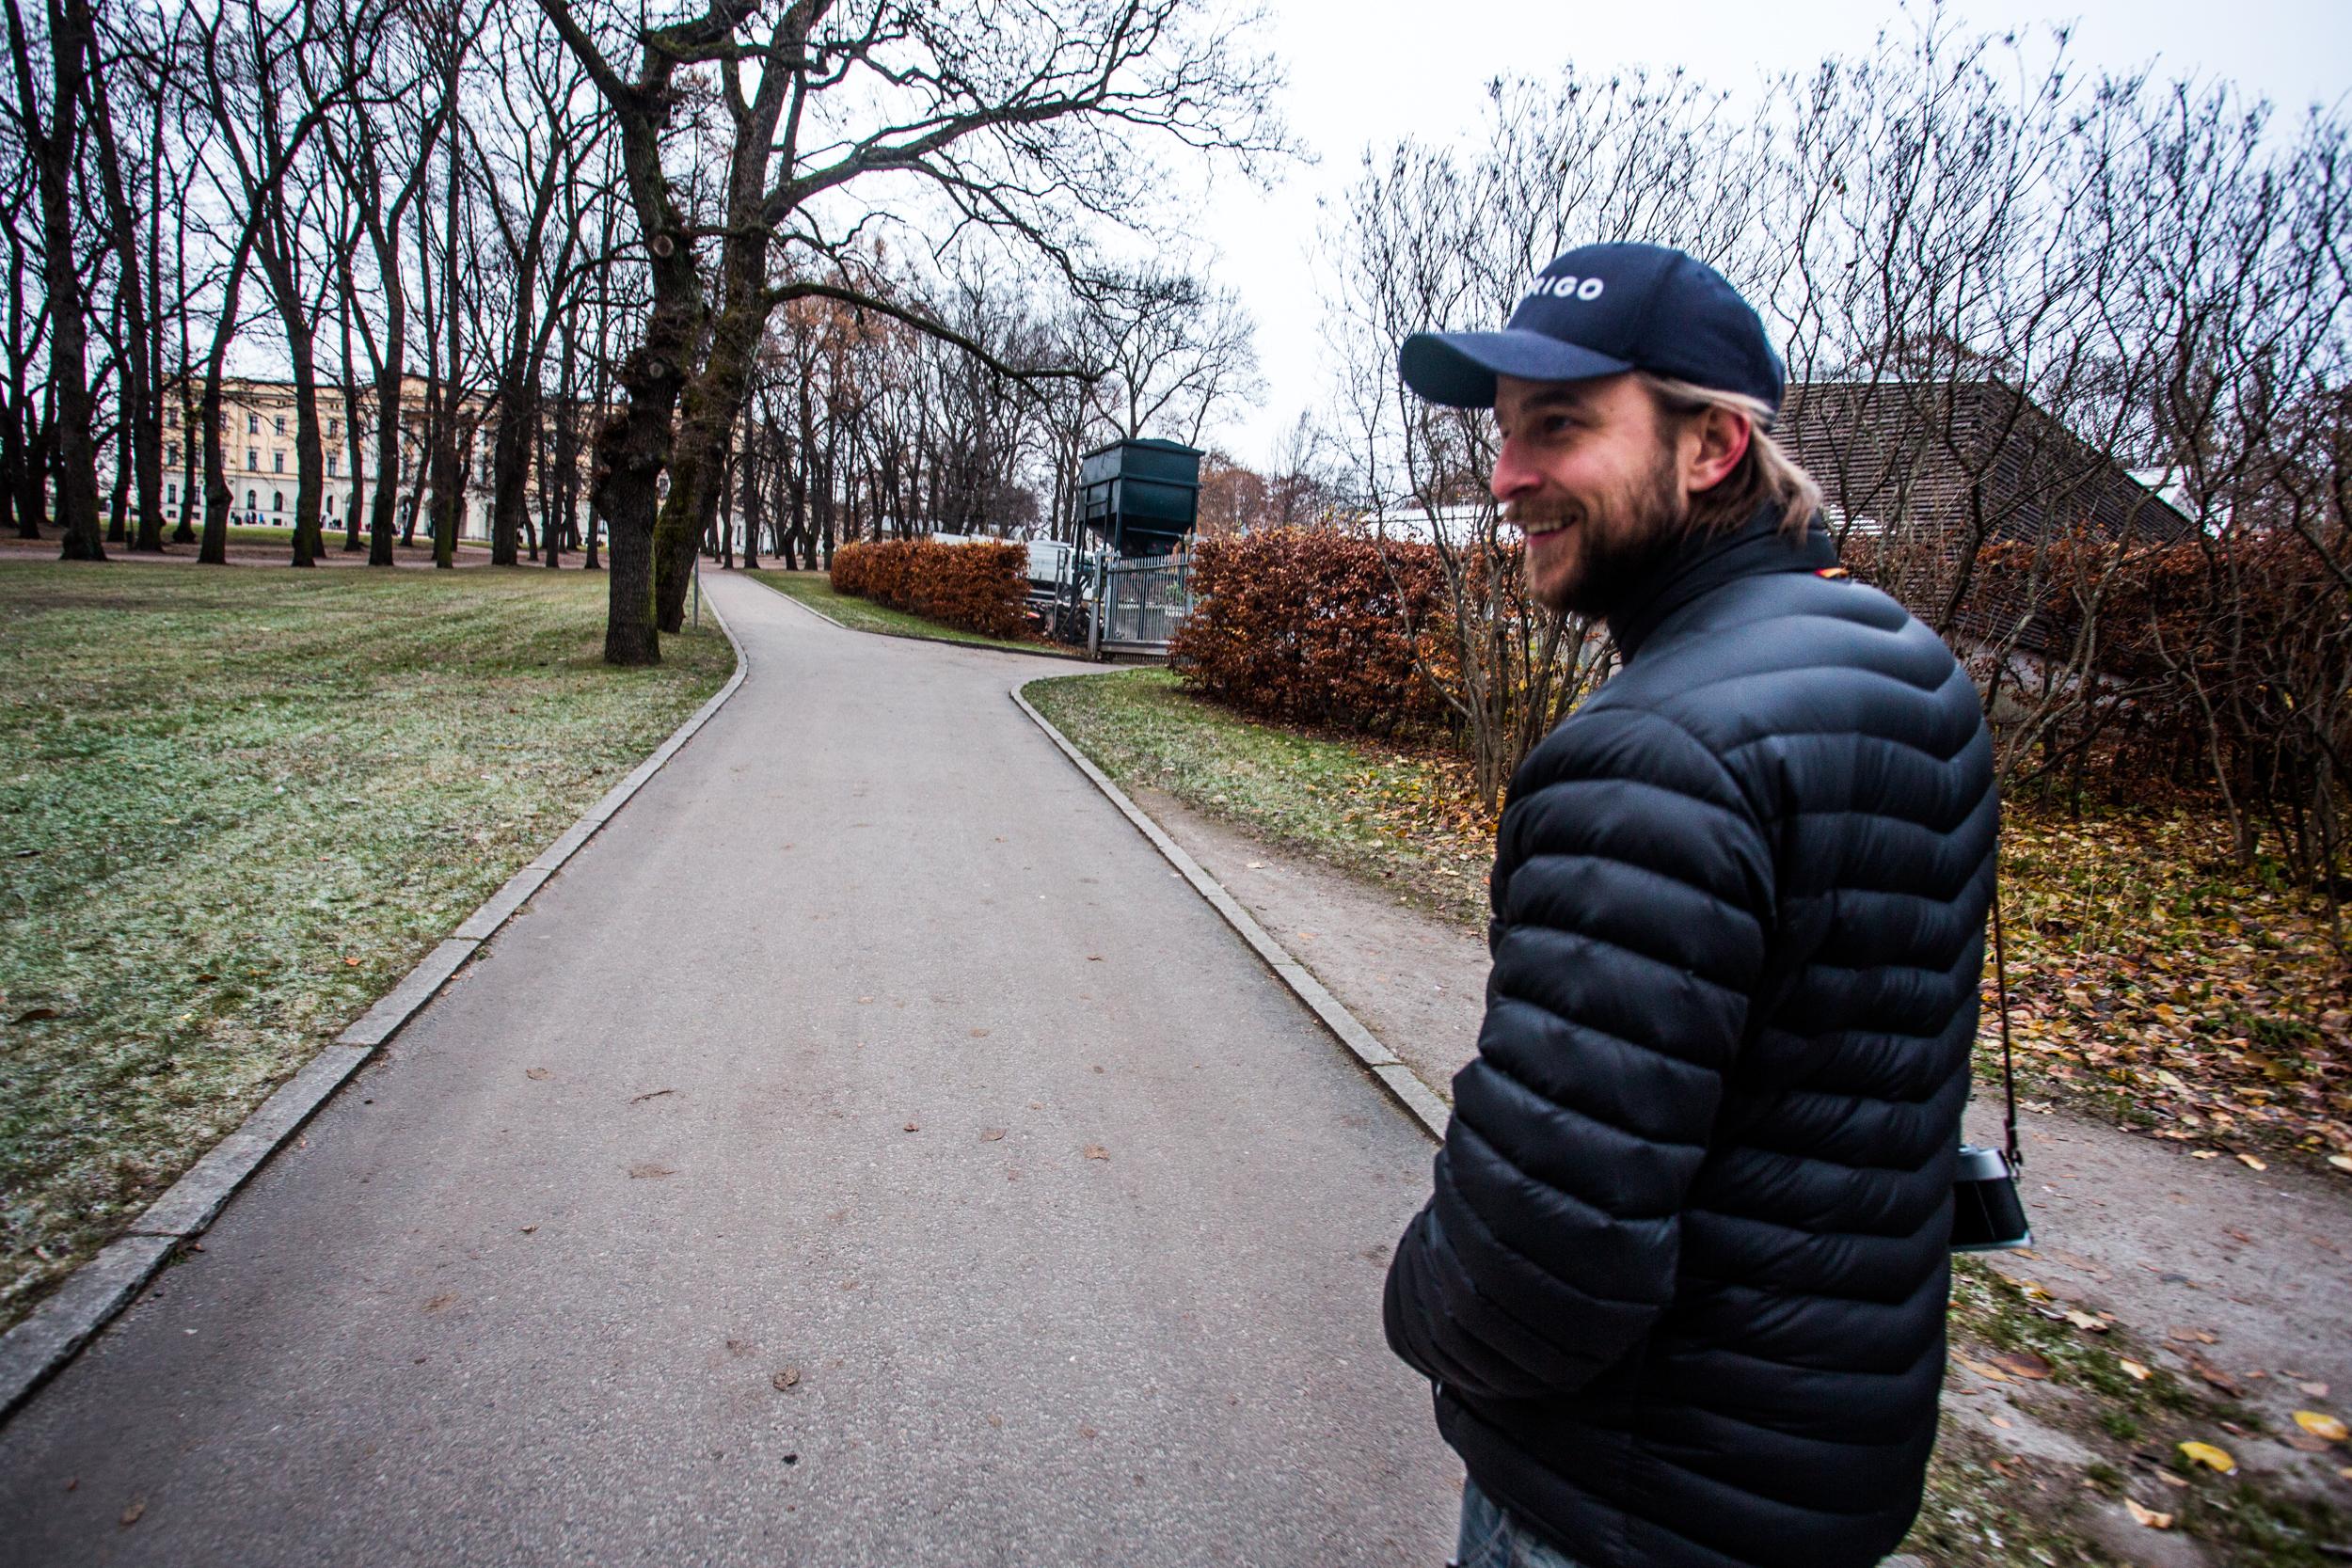 211115_fausko_oslo_høst_fotovandring_homans_gustav_jens_bjørnsund-2.jpg